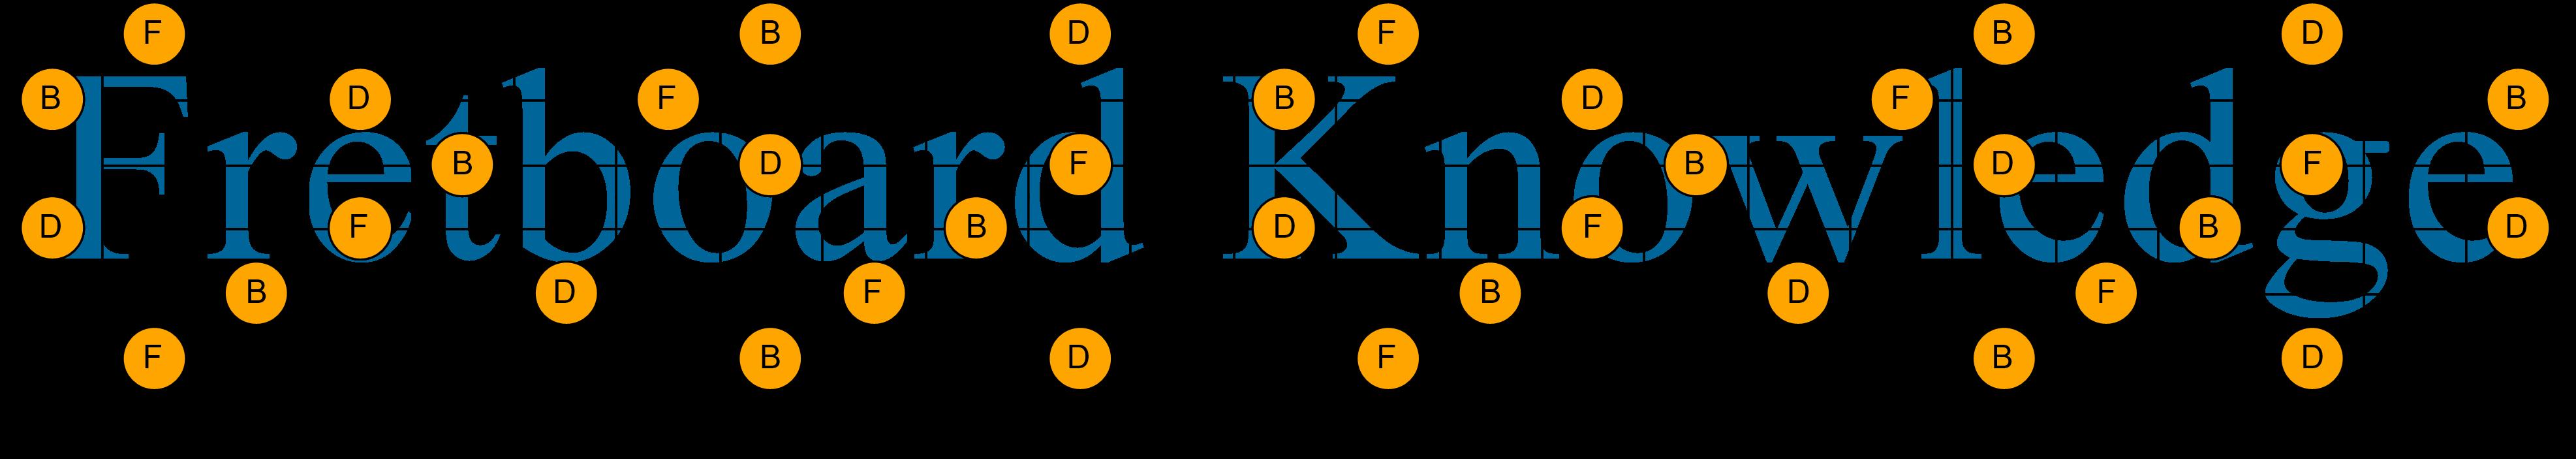 B Diminished Triad Guitar Fretboard Knowledge